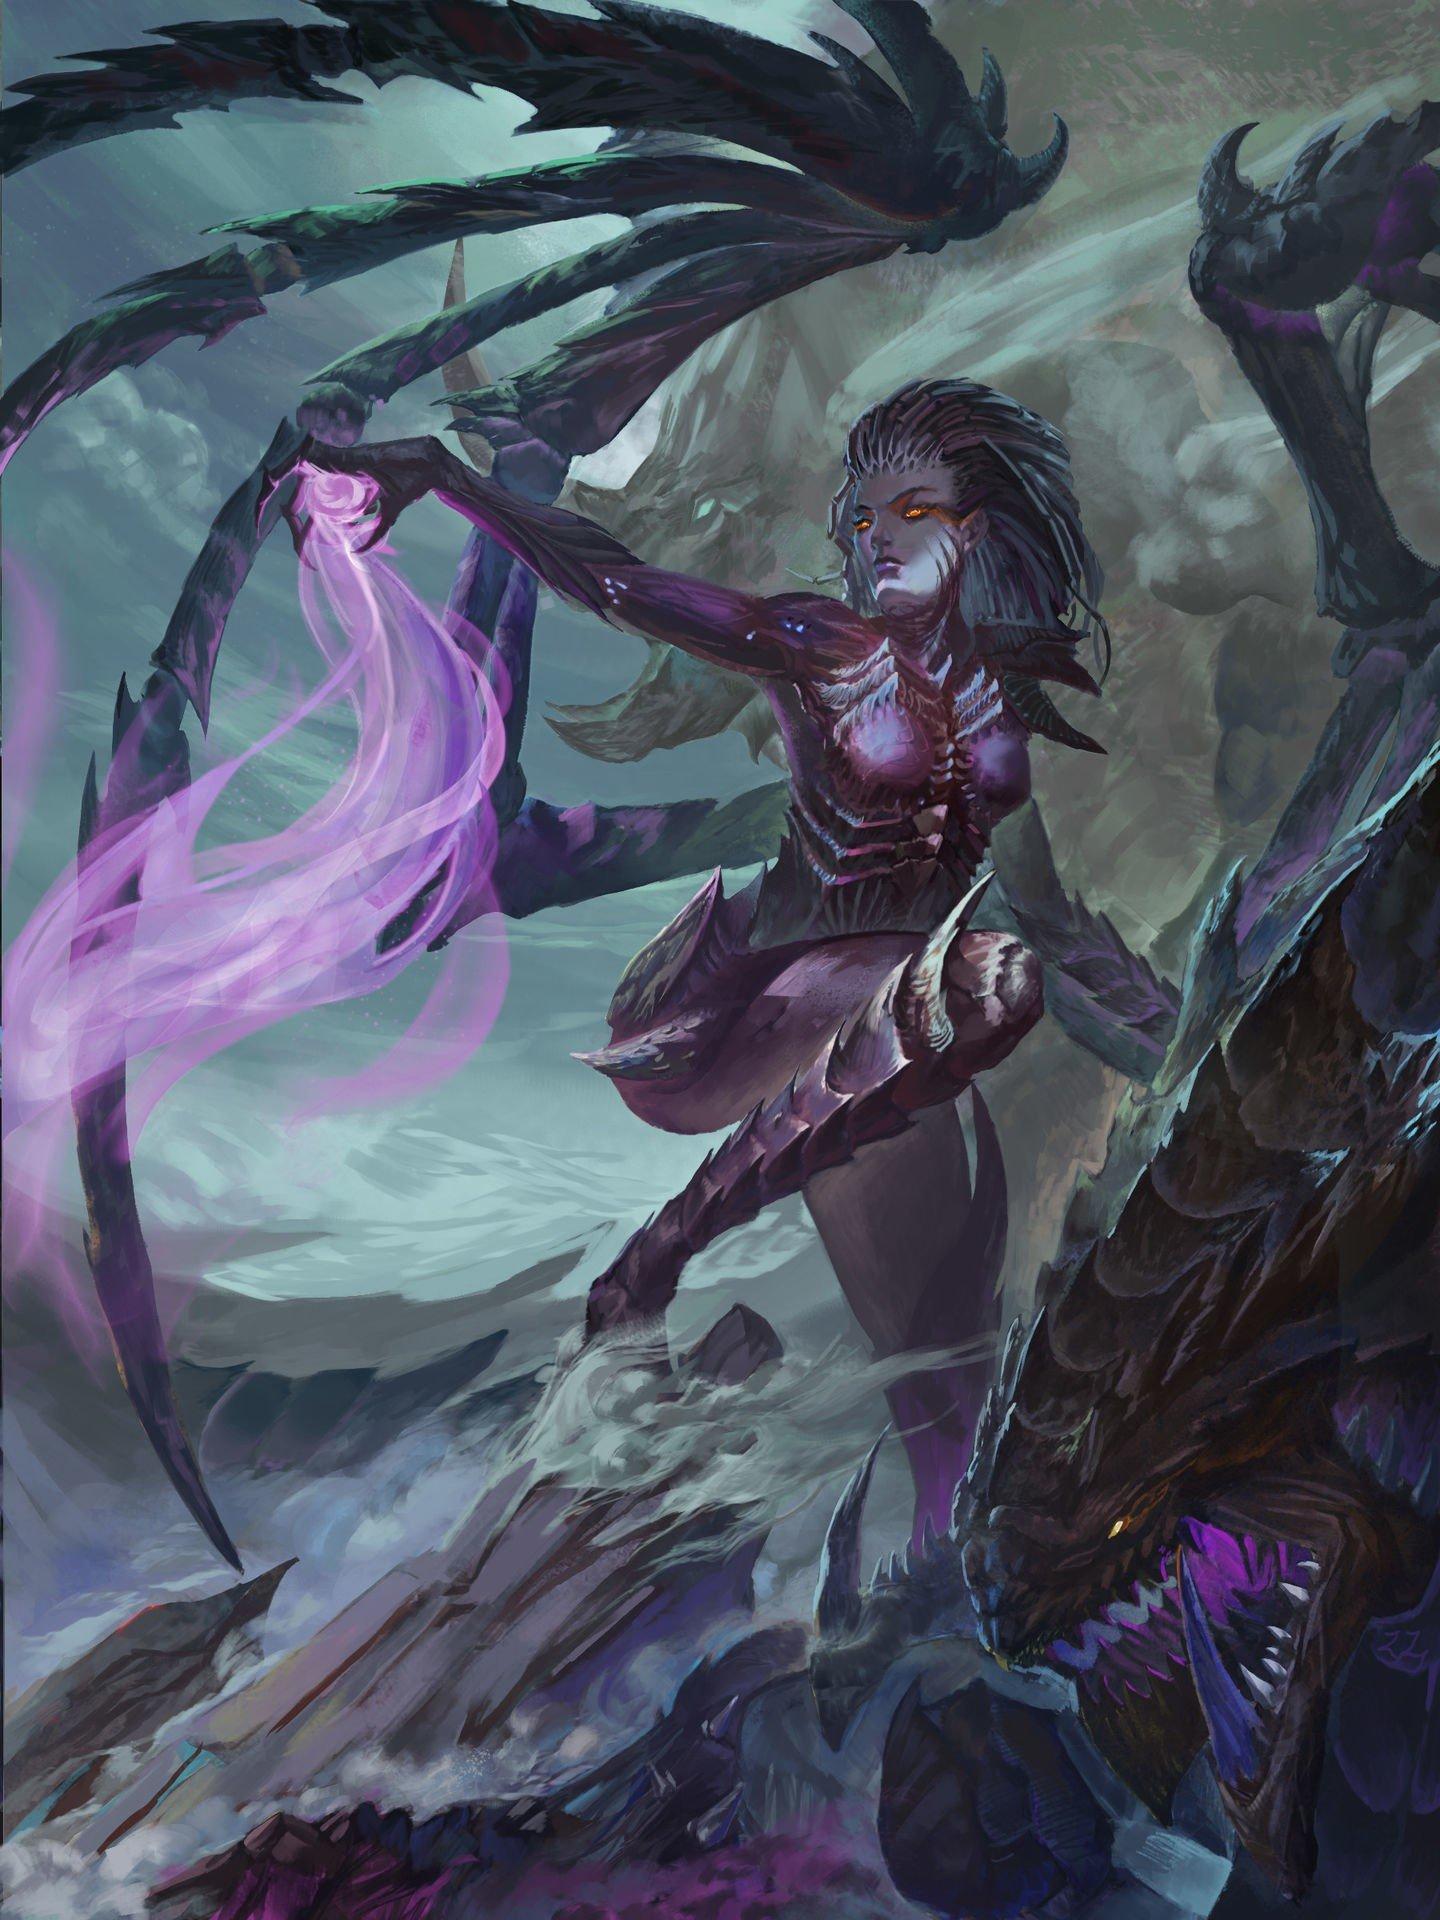 World Of Warcraft Wallpapers Hd Sarah Kerrigan Fantasy Art Magic Video Games Hydralisk